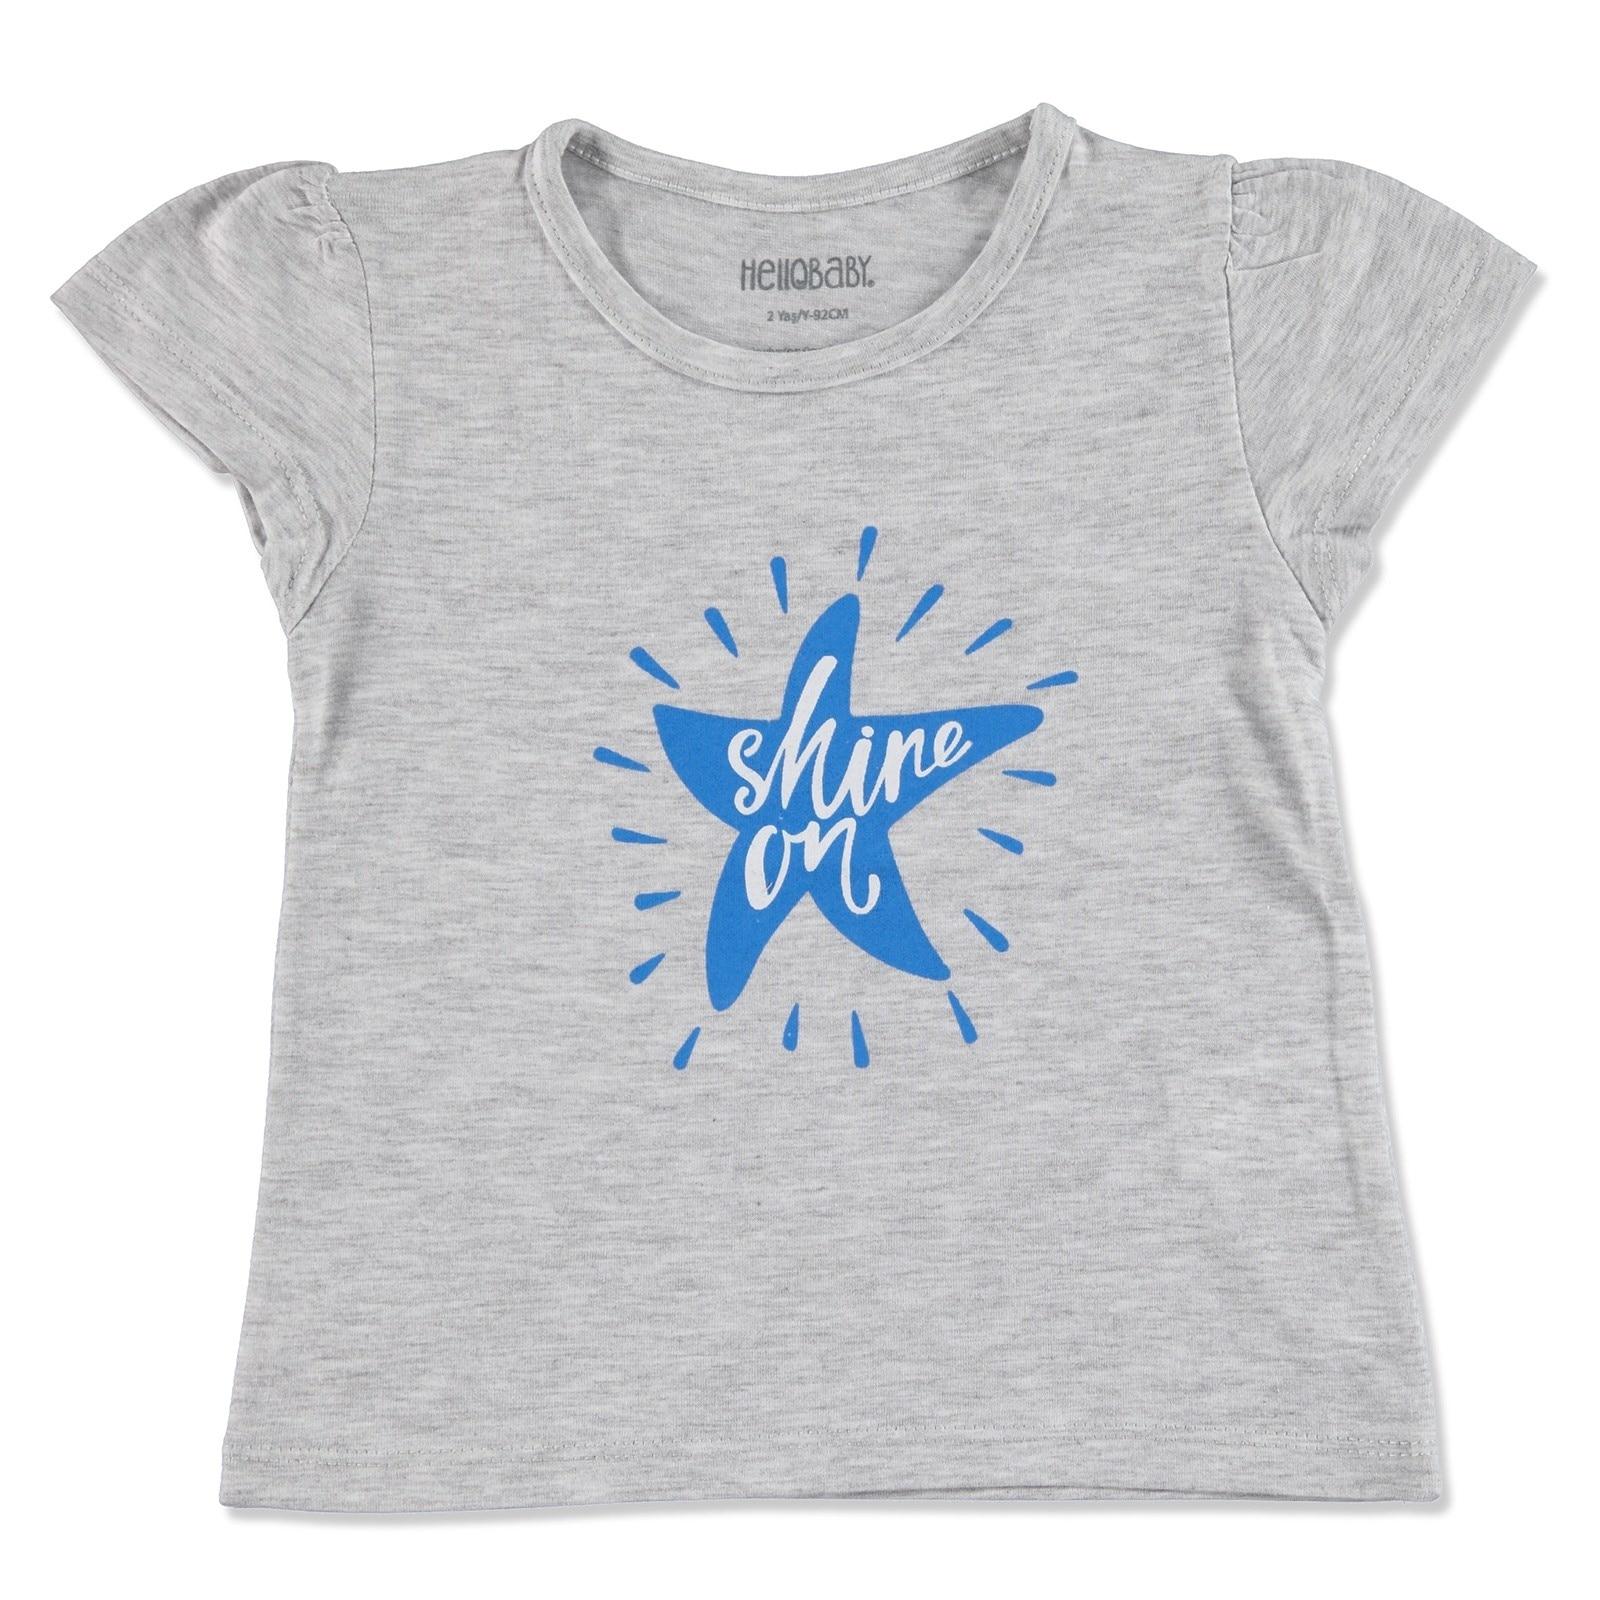 Ebebek HelloBaby Basic Baby Short Sleeve T-shirt